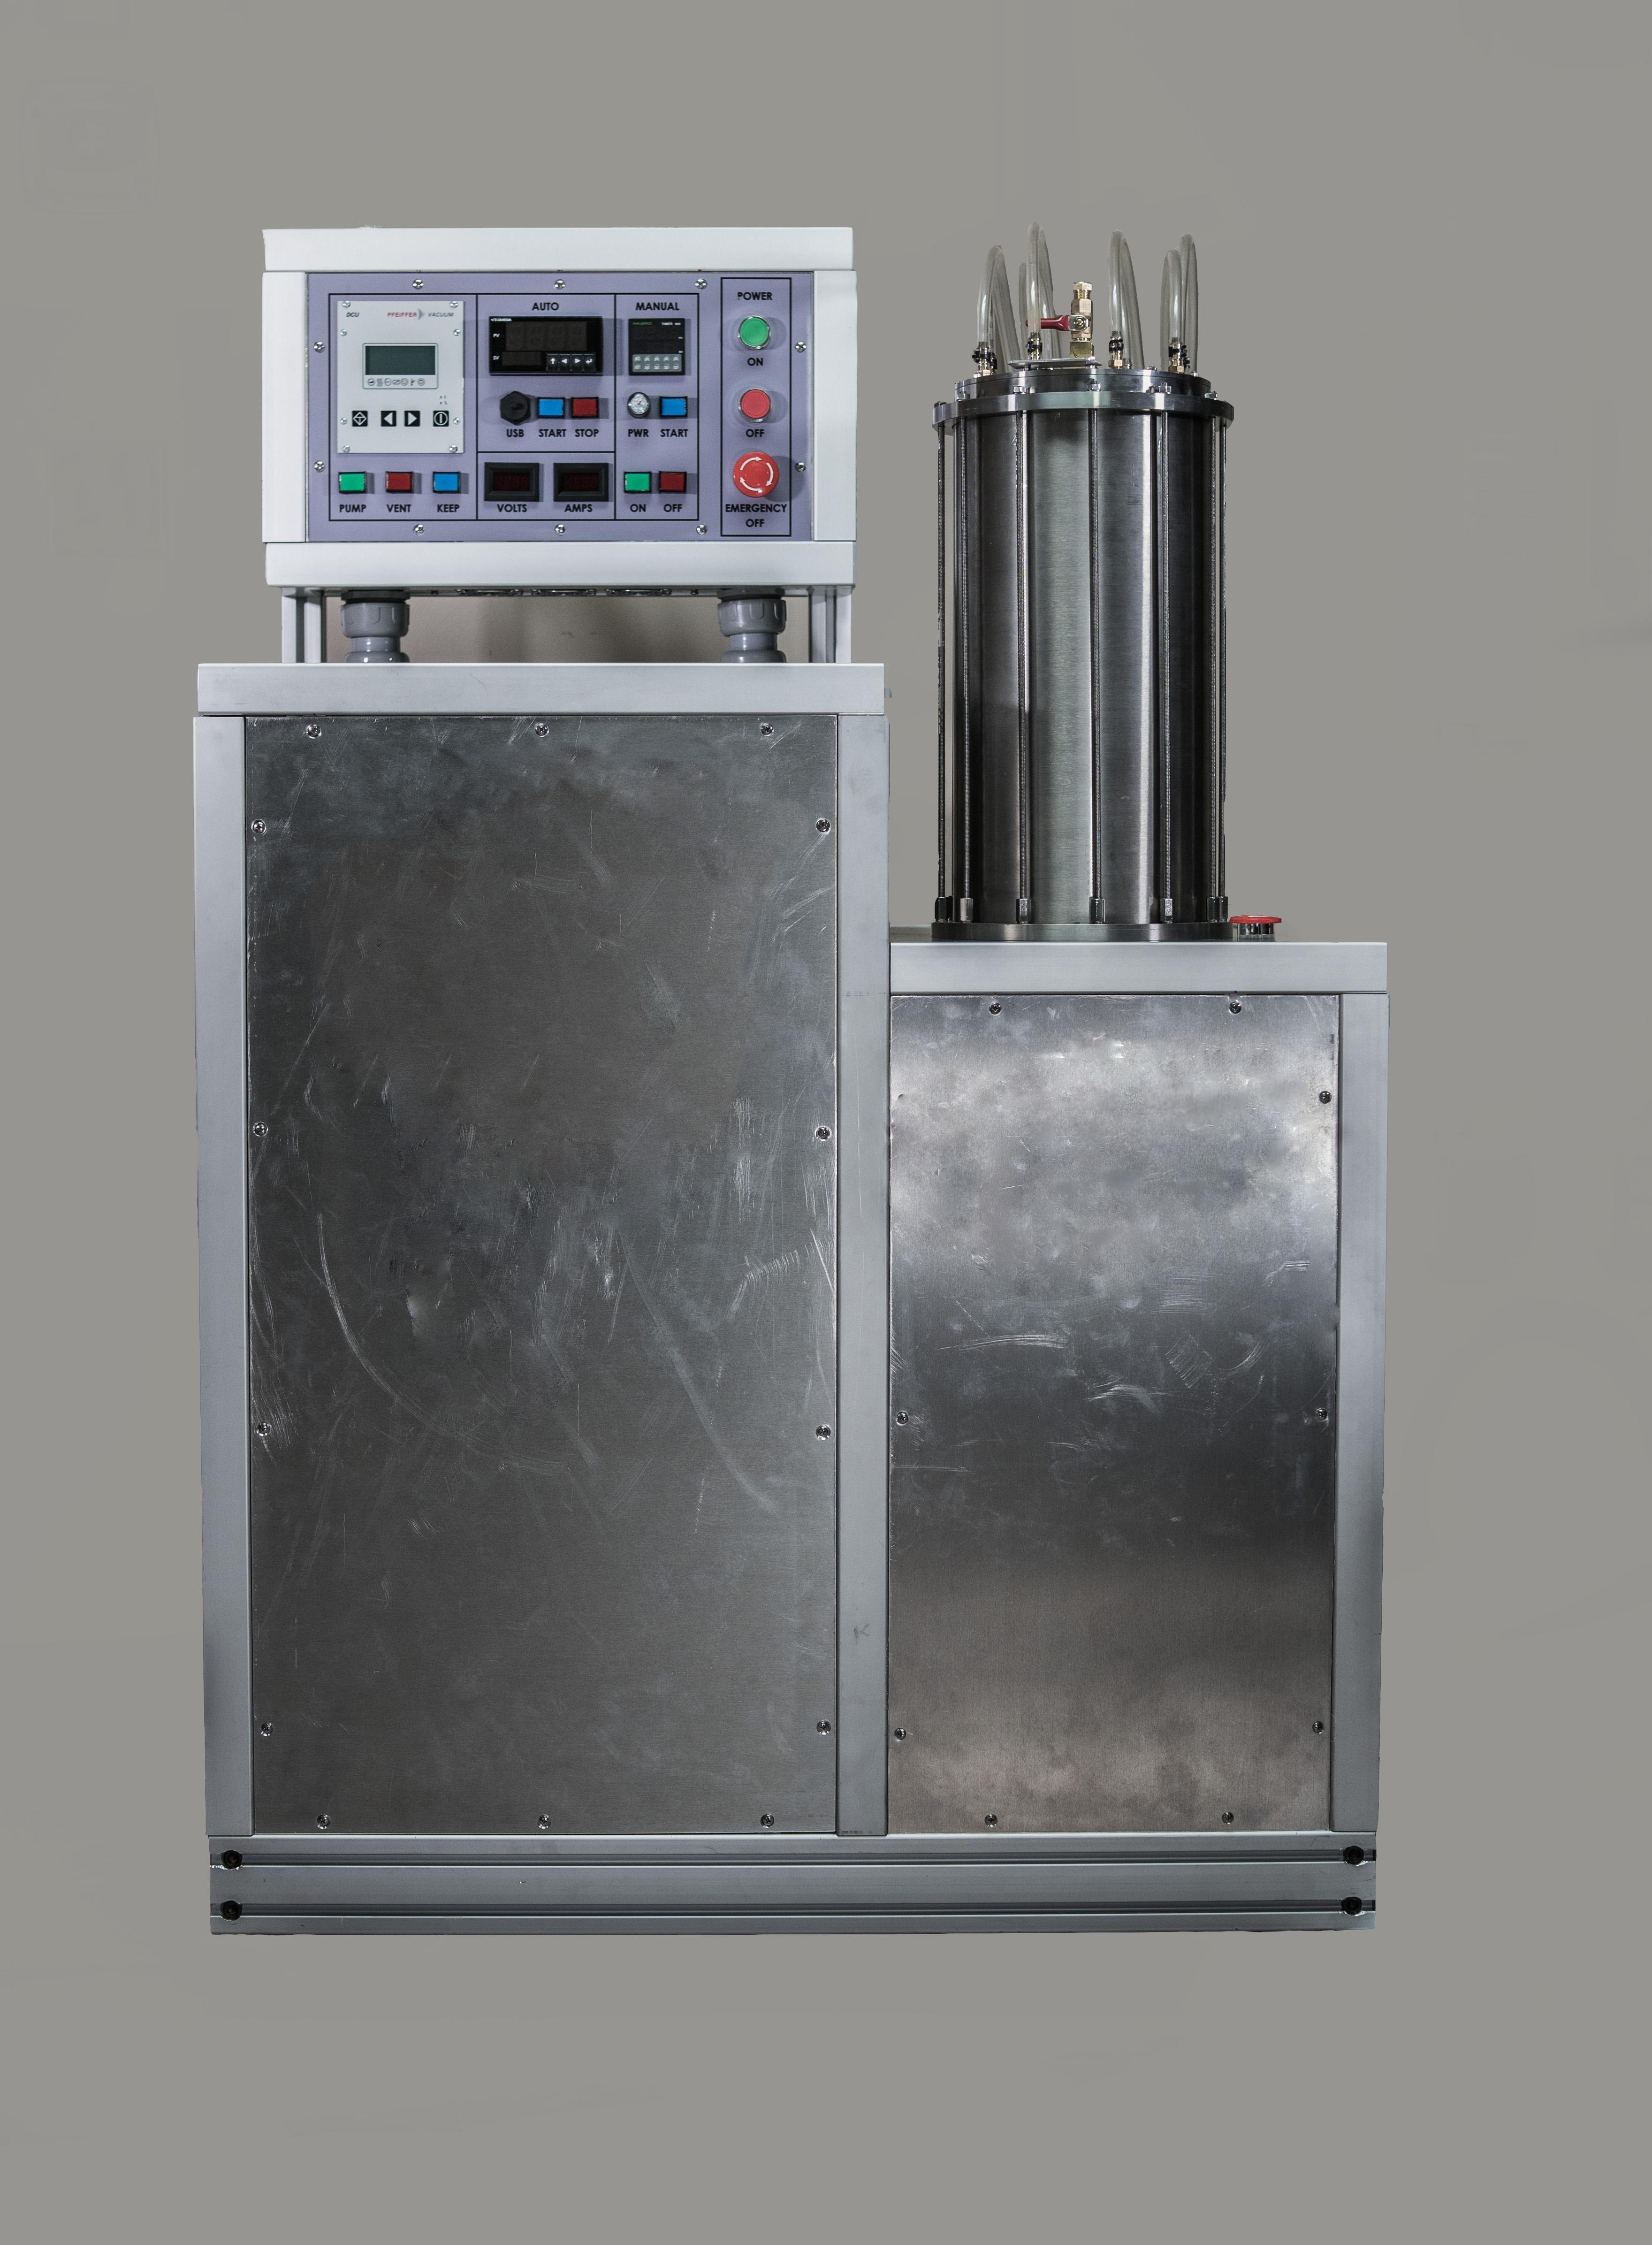 Ultra-high Temperature 2400C (4,350F) Rapid Heating Vacuum Furnace / Laboratory Oven